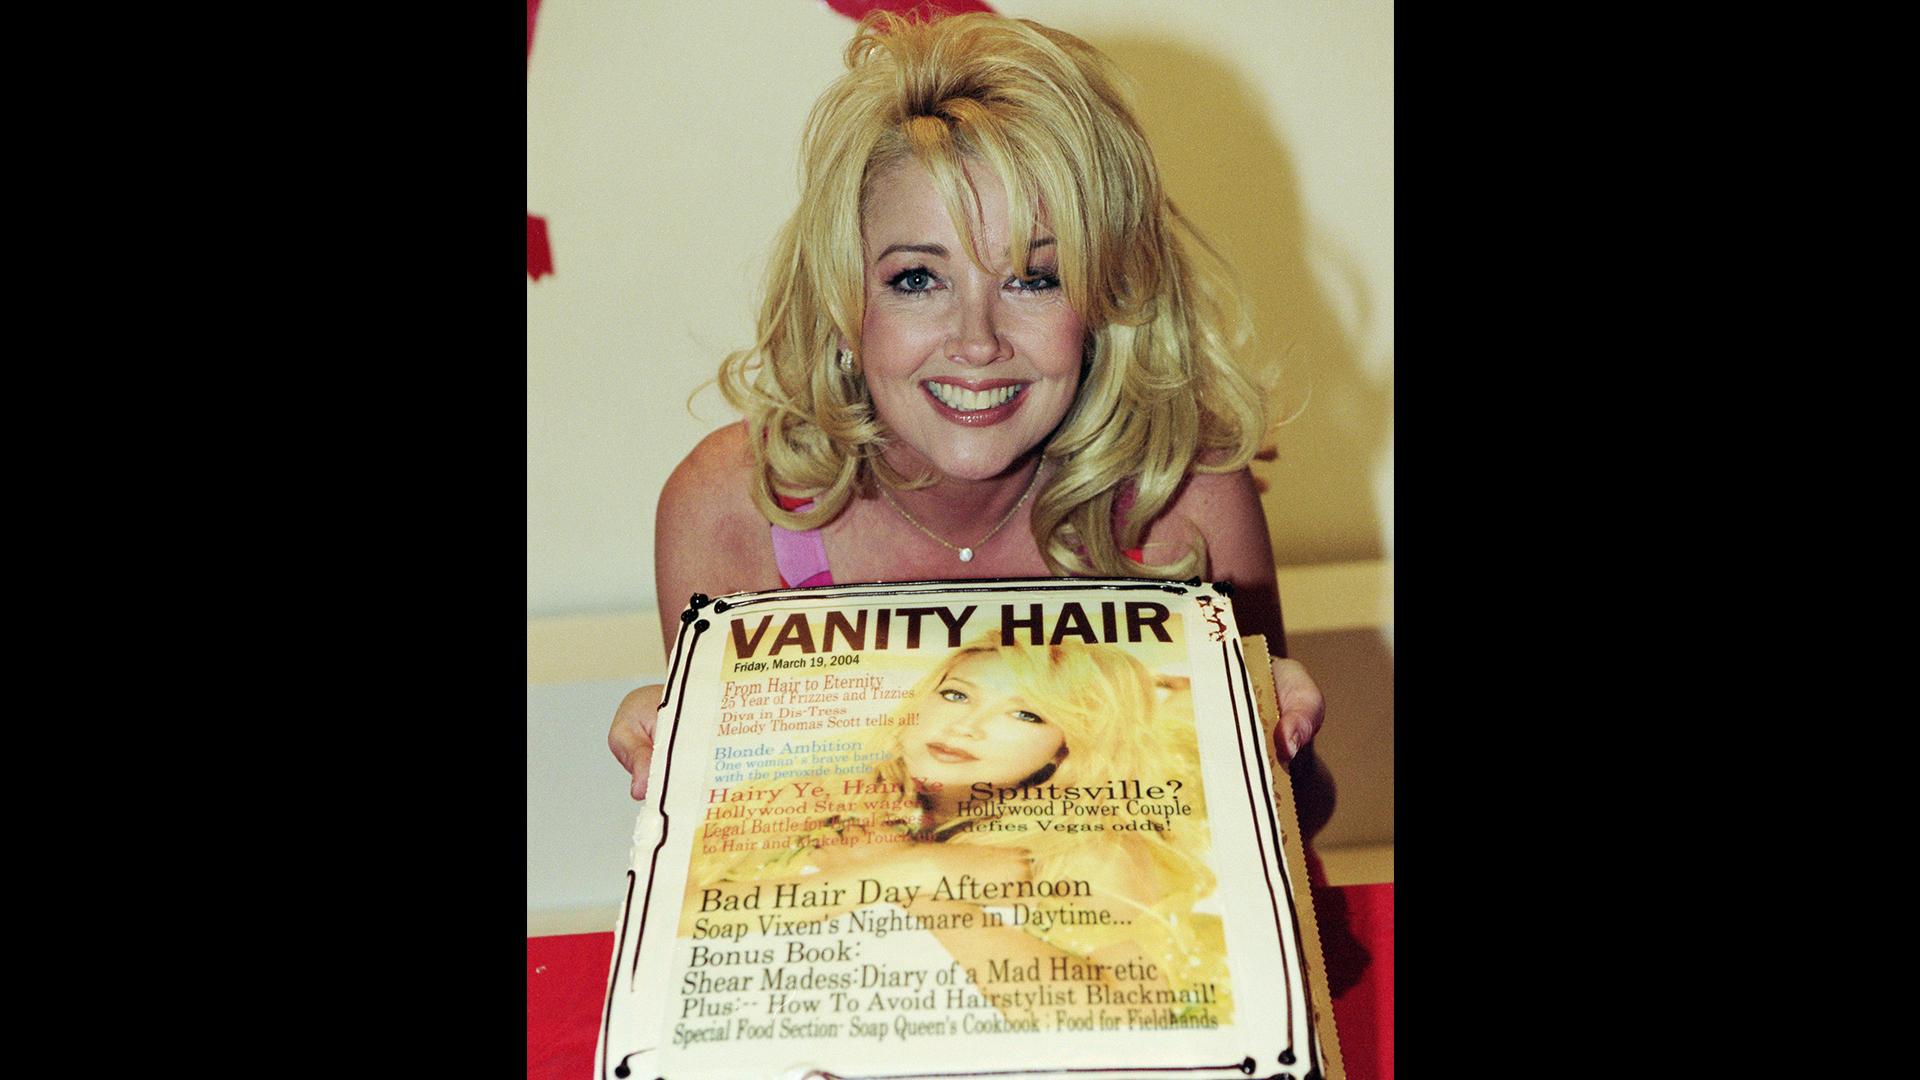 Melody Thomas Scott poses with her congratulatory cake honoring 25 years of Nikki Newman.